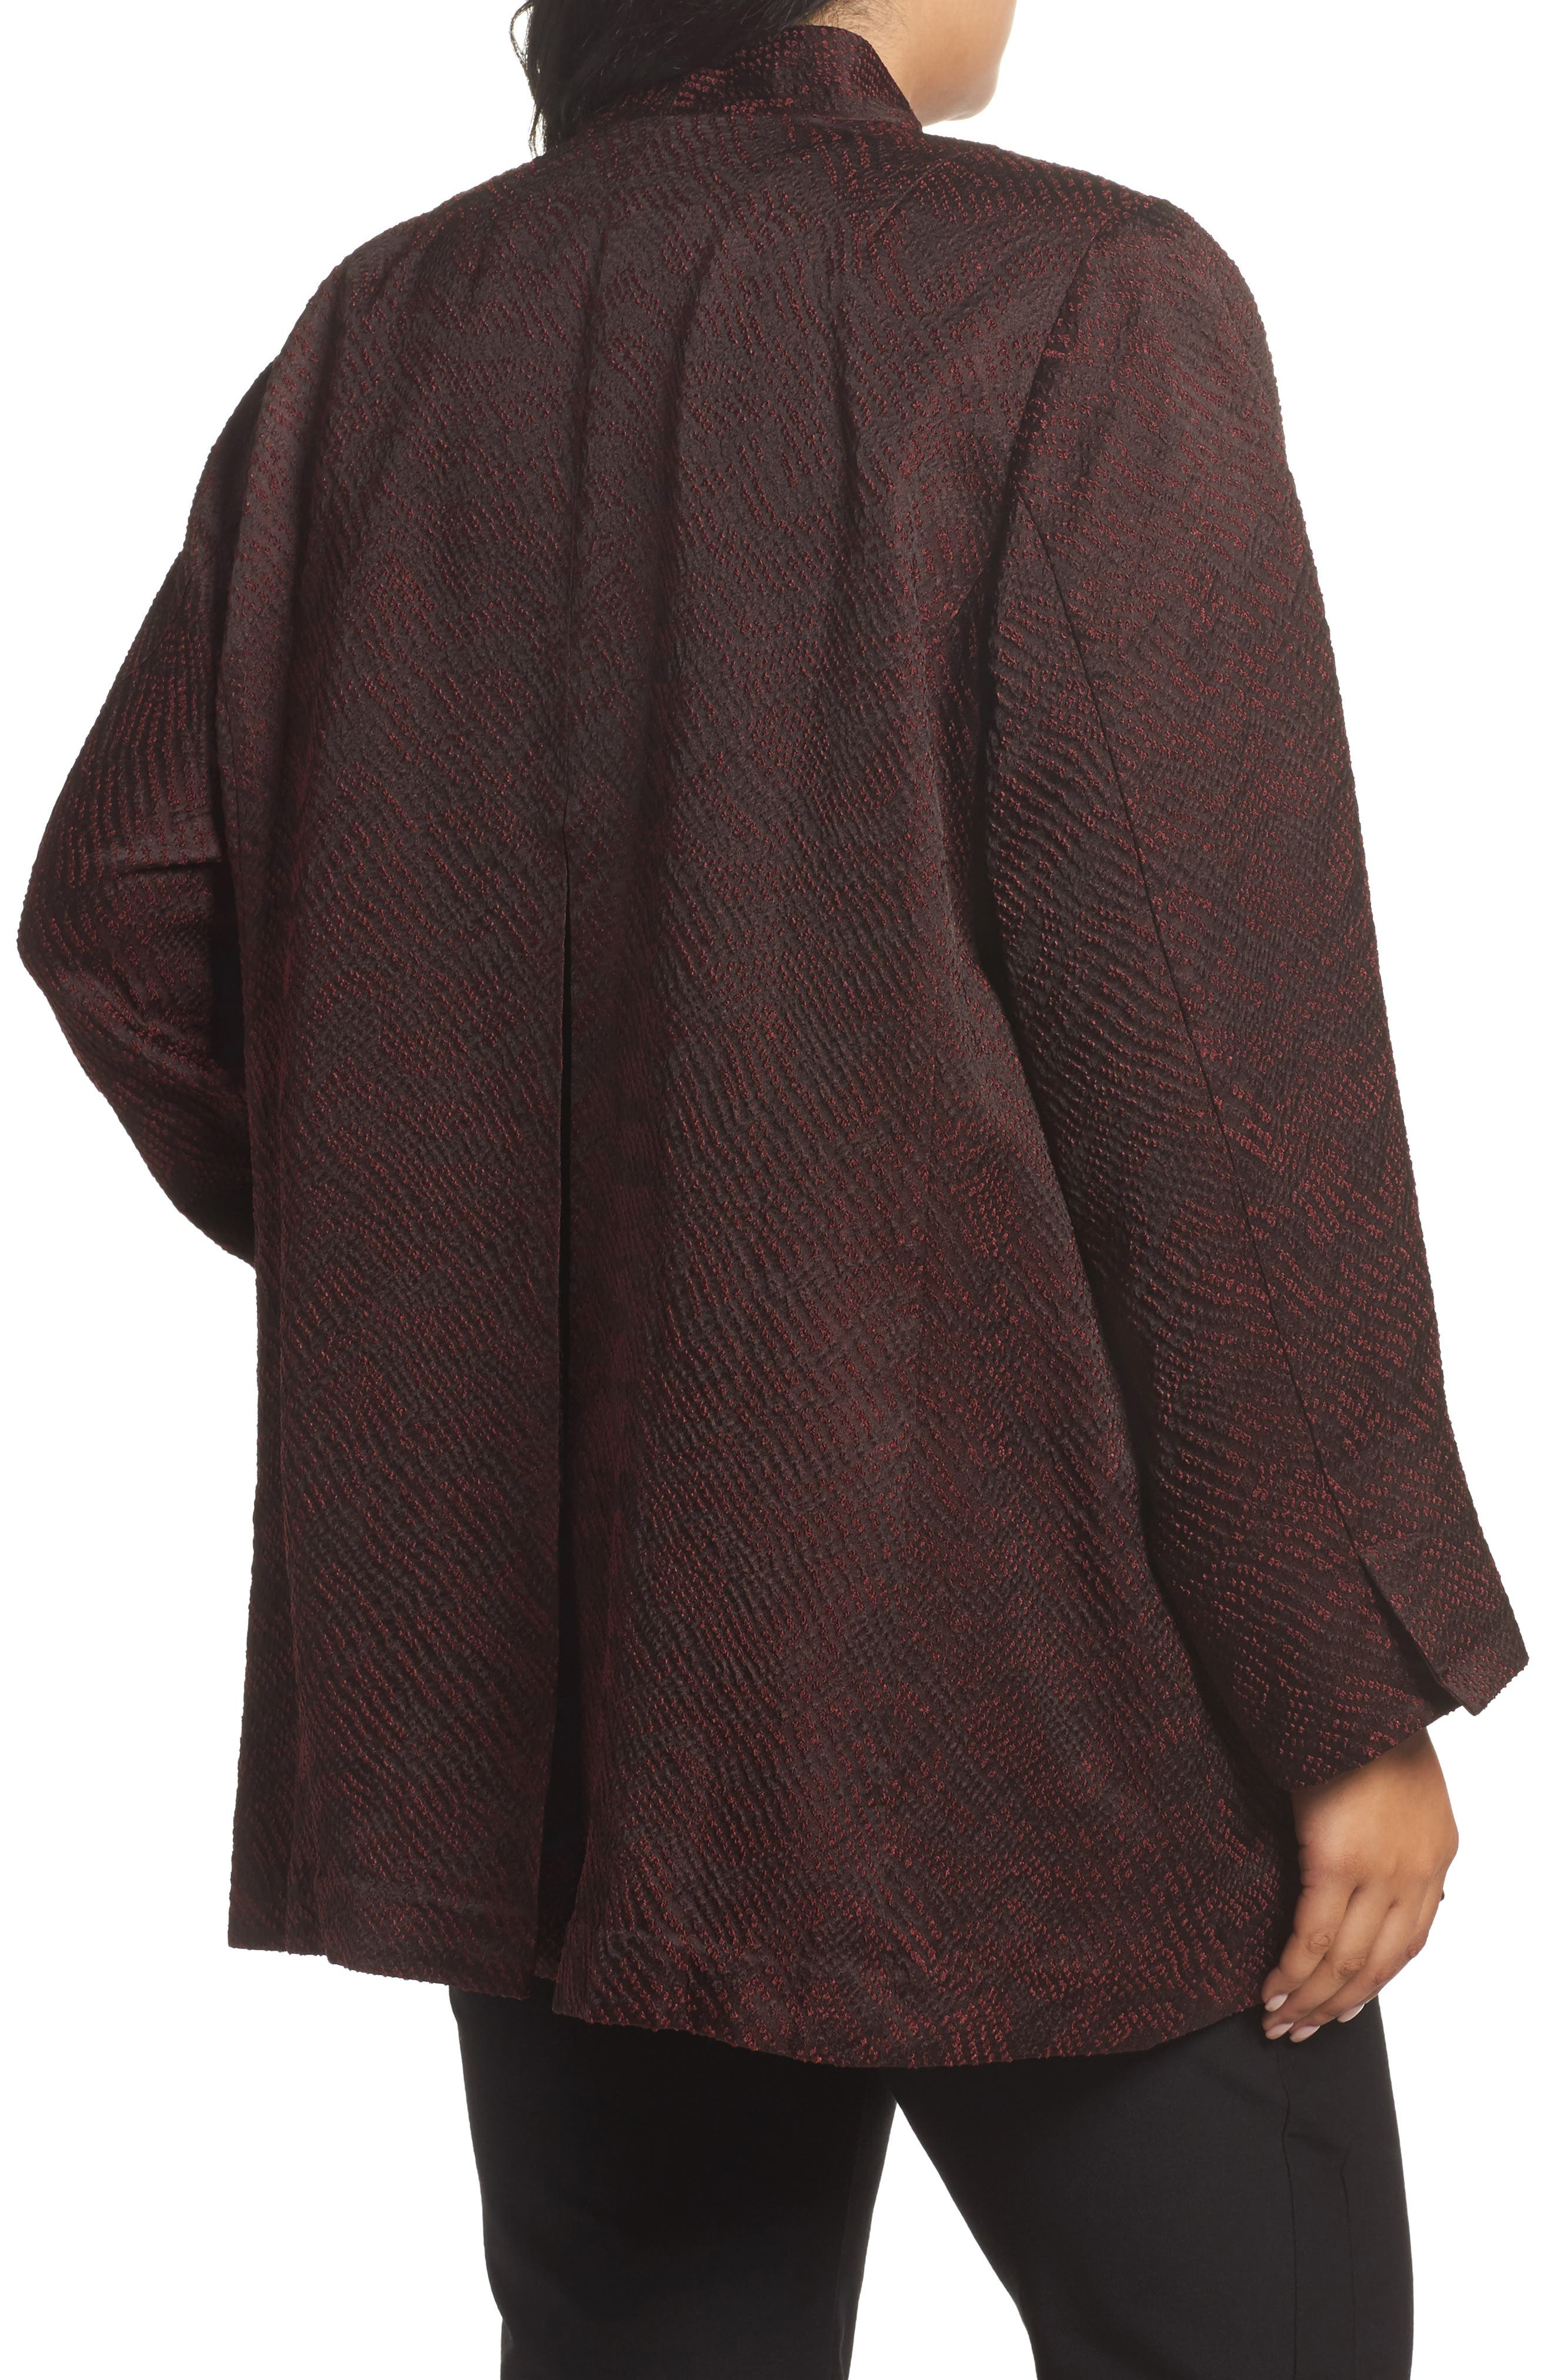 Alternate Image 2  - Eileen Fisher Silk Blend Jacquard Jacket (Plus Size)